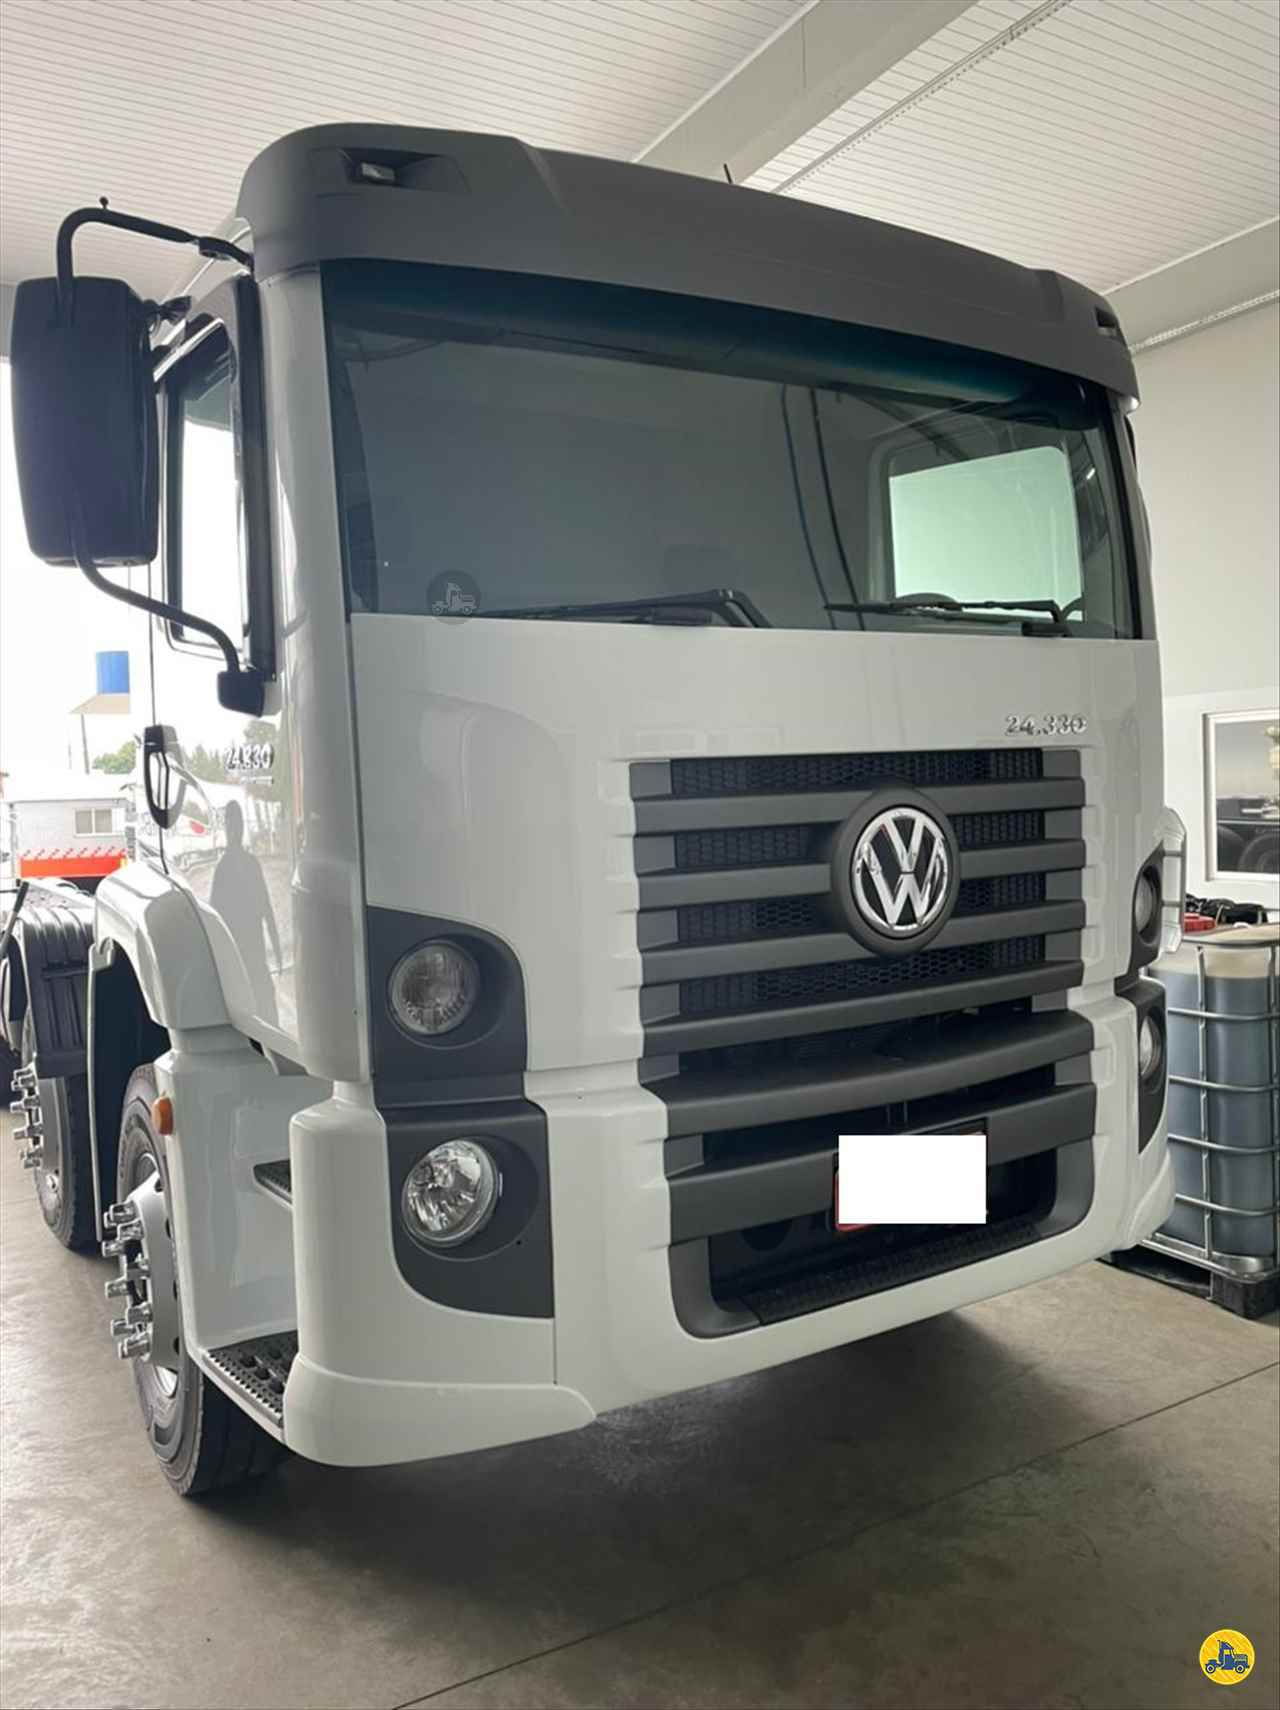 CAMINHAO VOLKSWAGEN VW 24330 Chassis Truck 6x2 Transmap Caminhões SANTA ROSA RIO GRANDE DO SUL RS